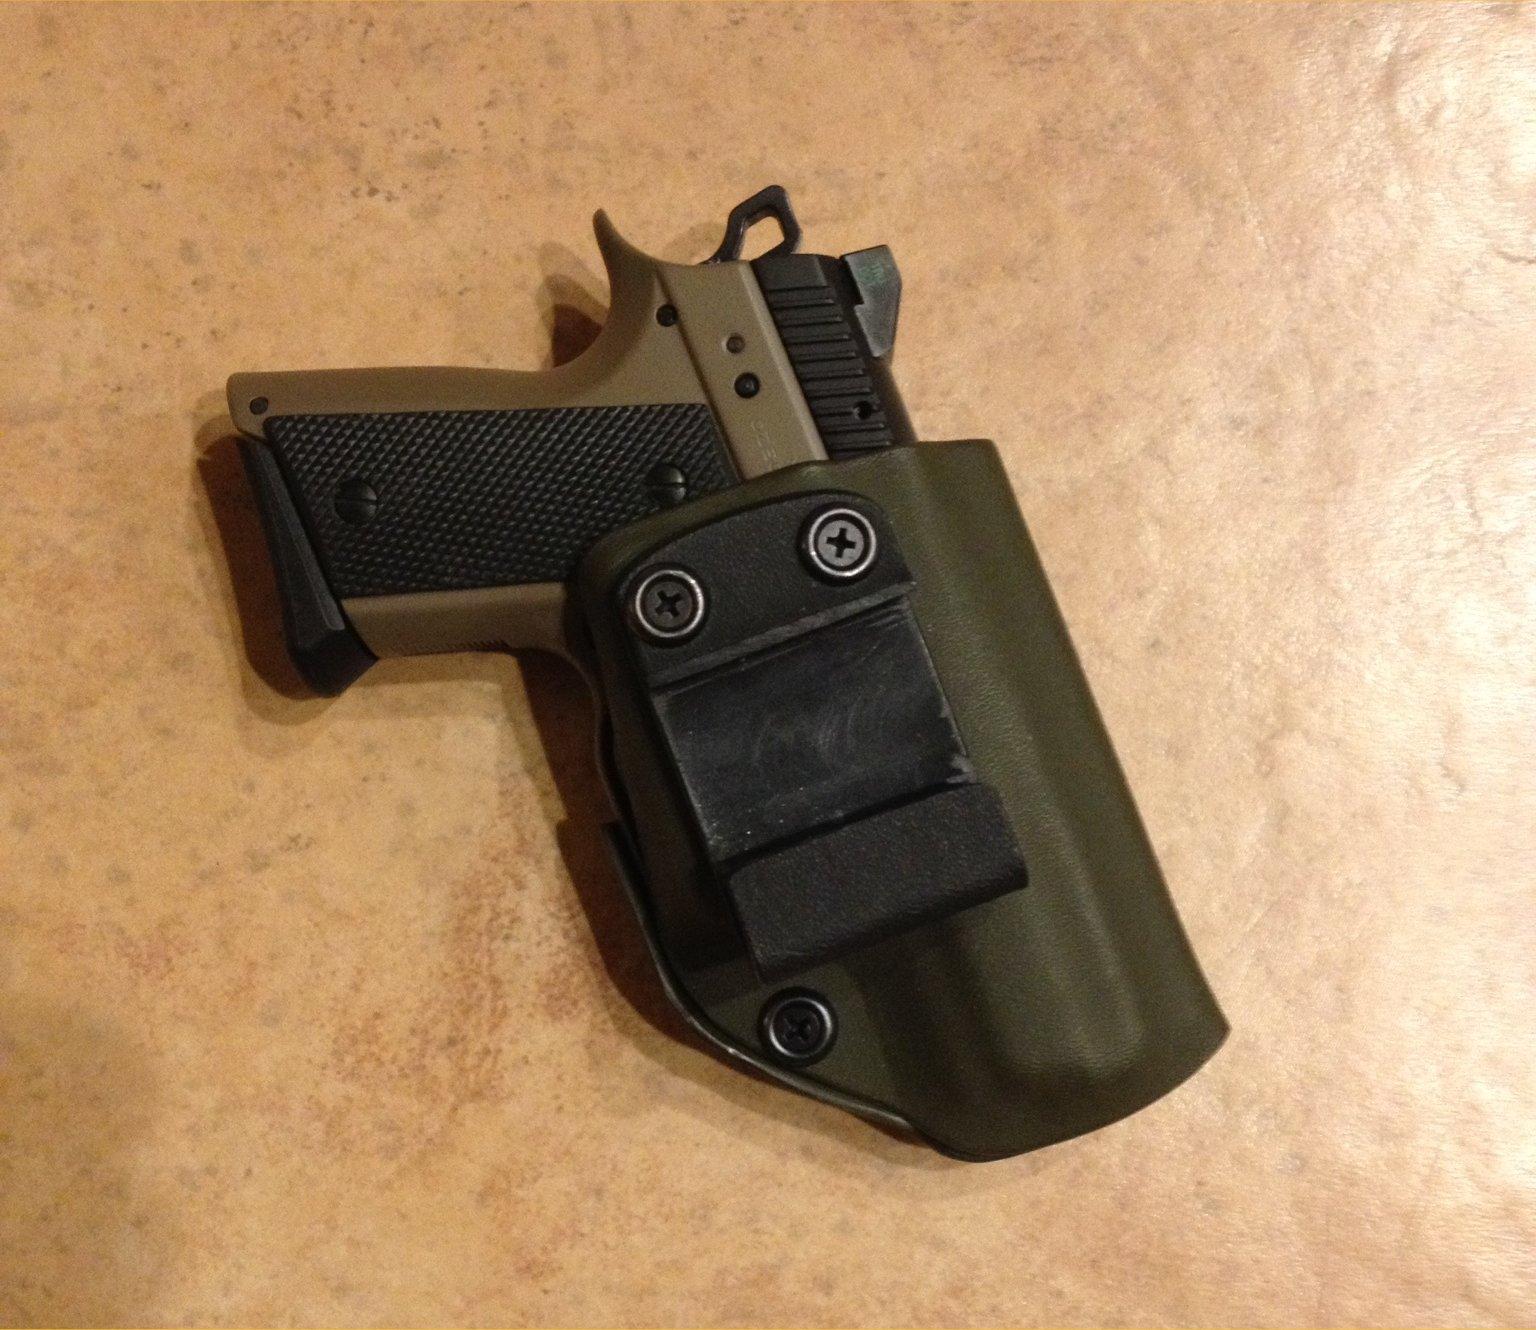 Cz 2075 Rami Bd Decocker Big Gun Performance In A Sub Compact Da